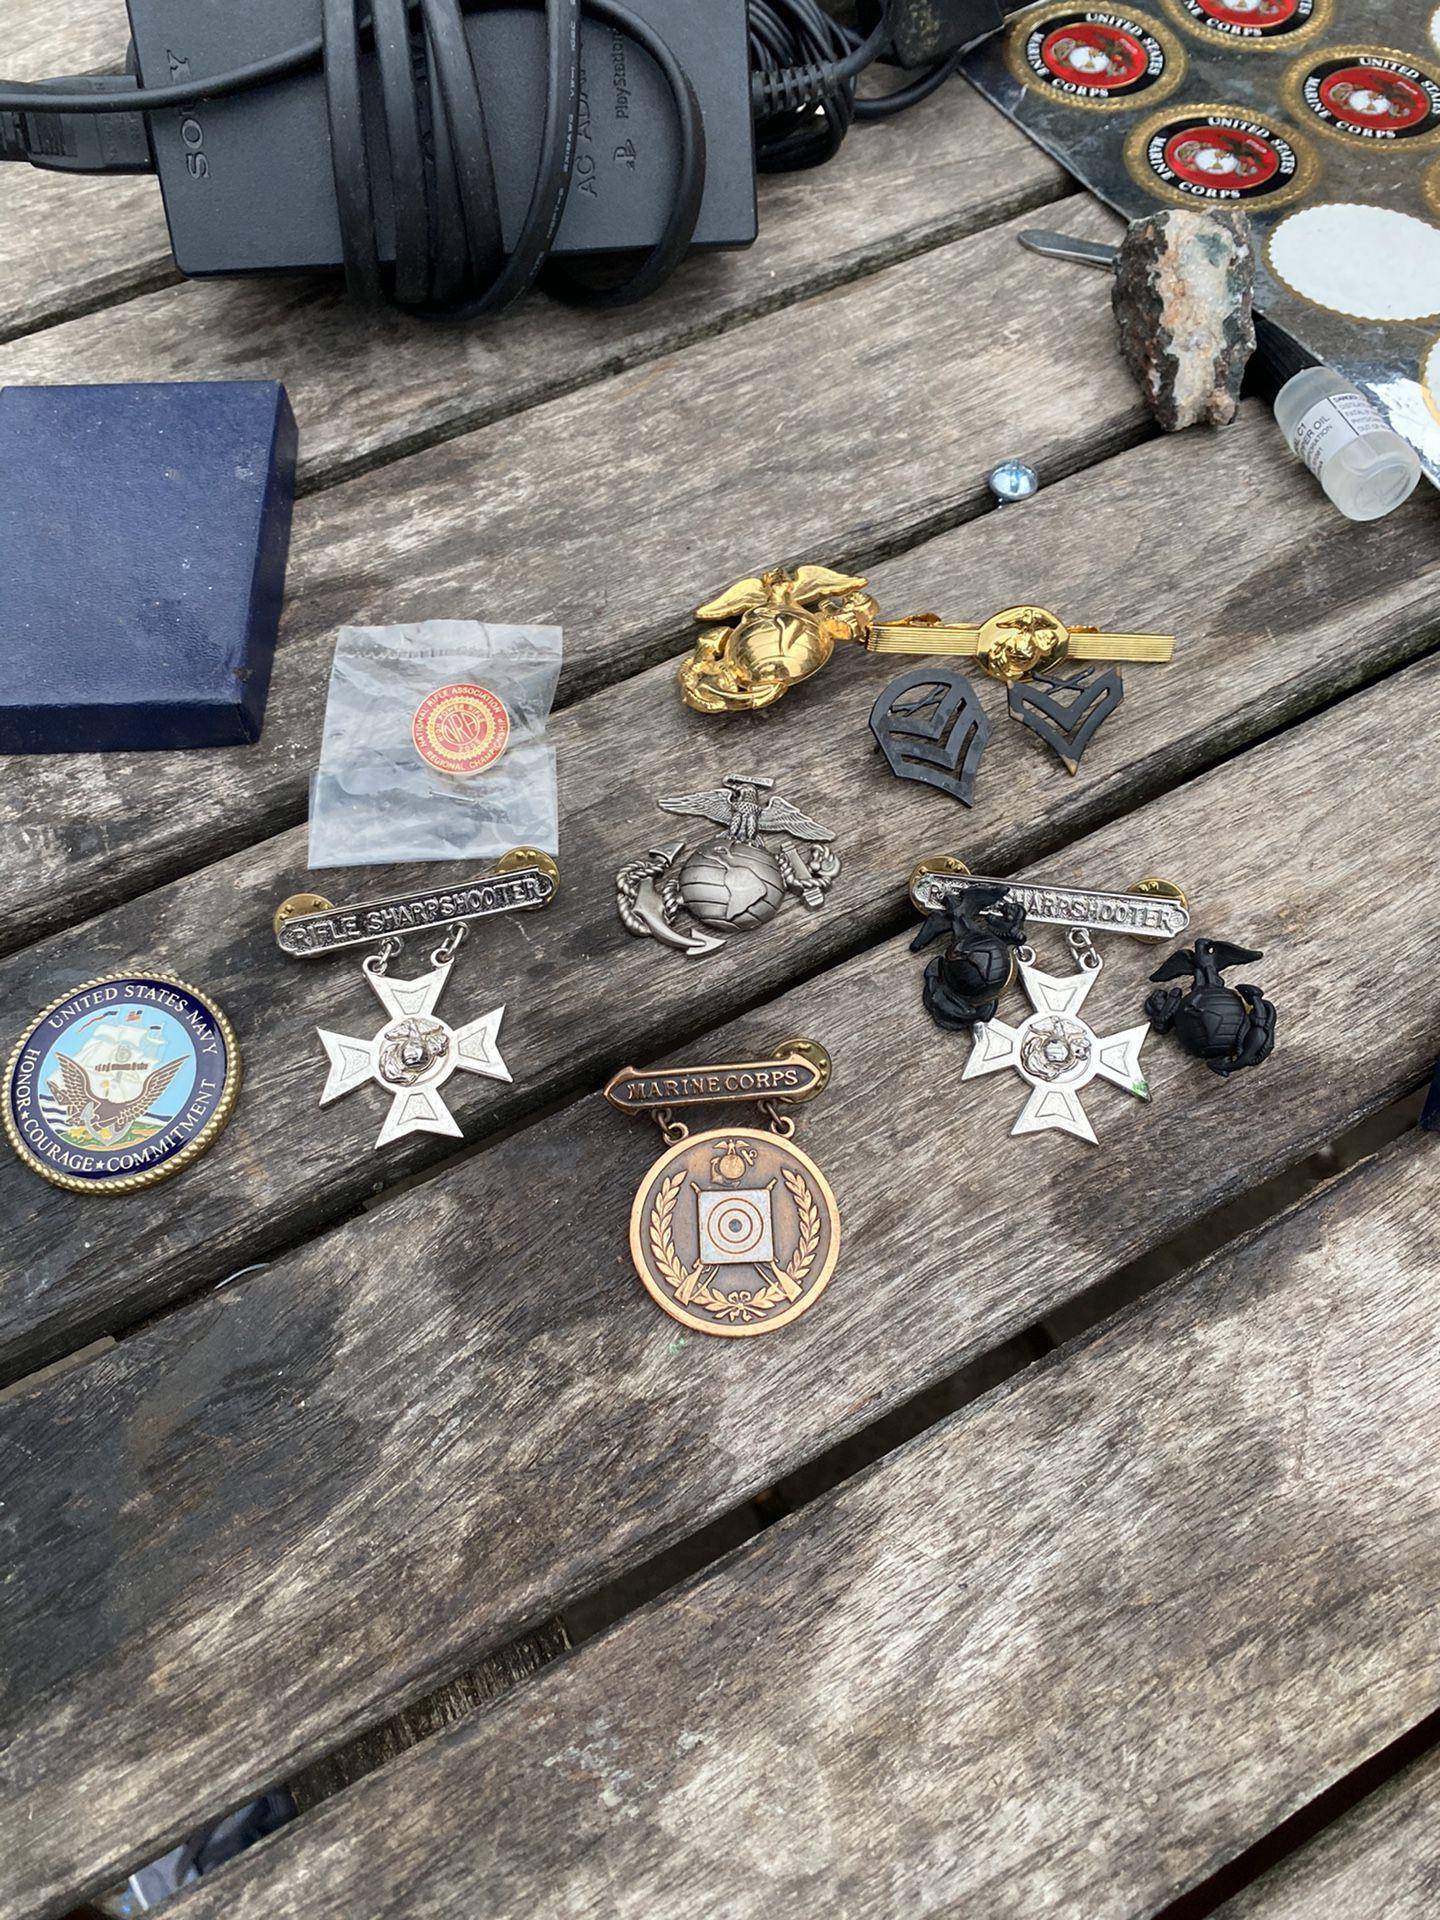 Marine corps badges